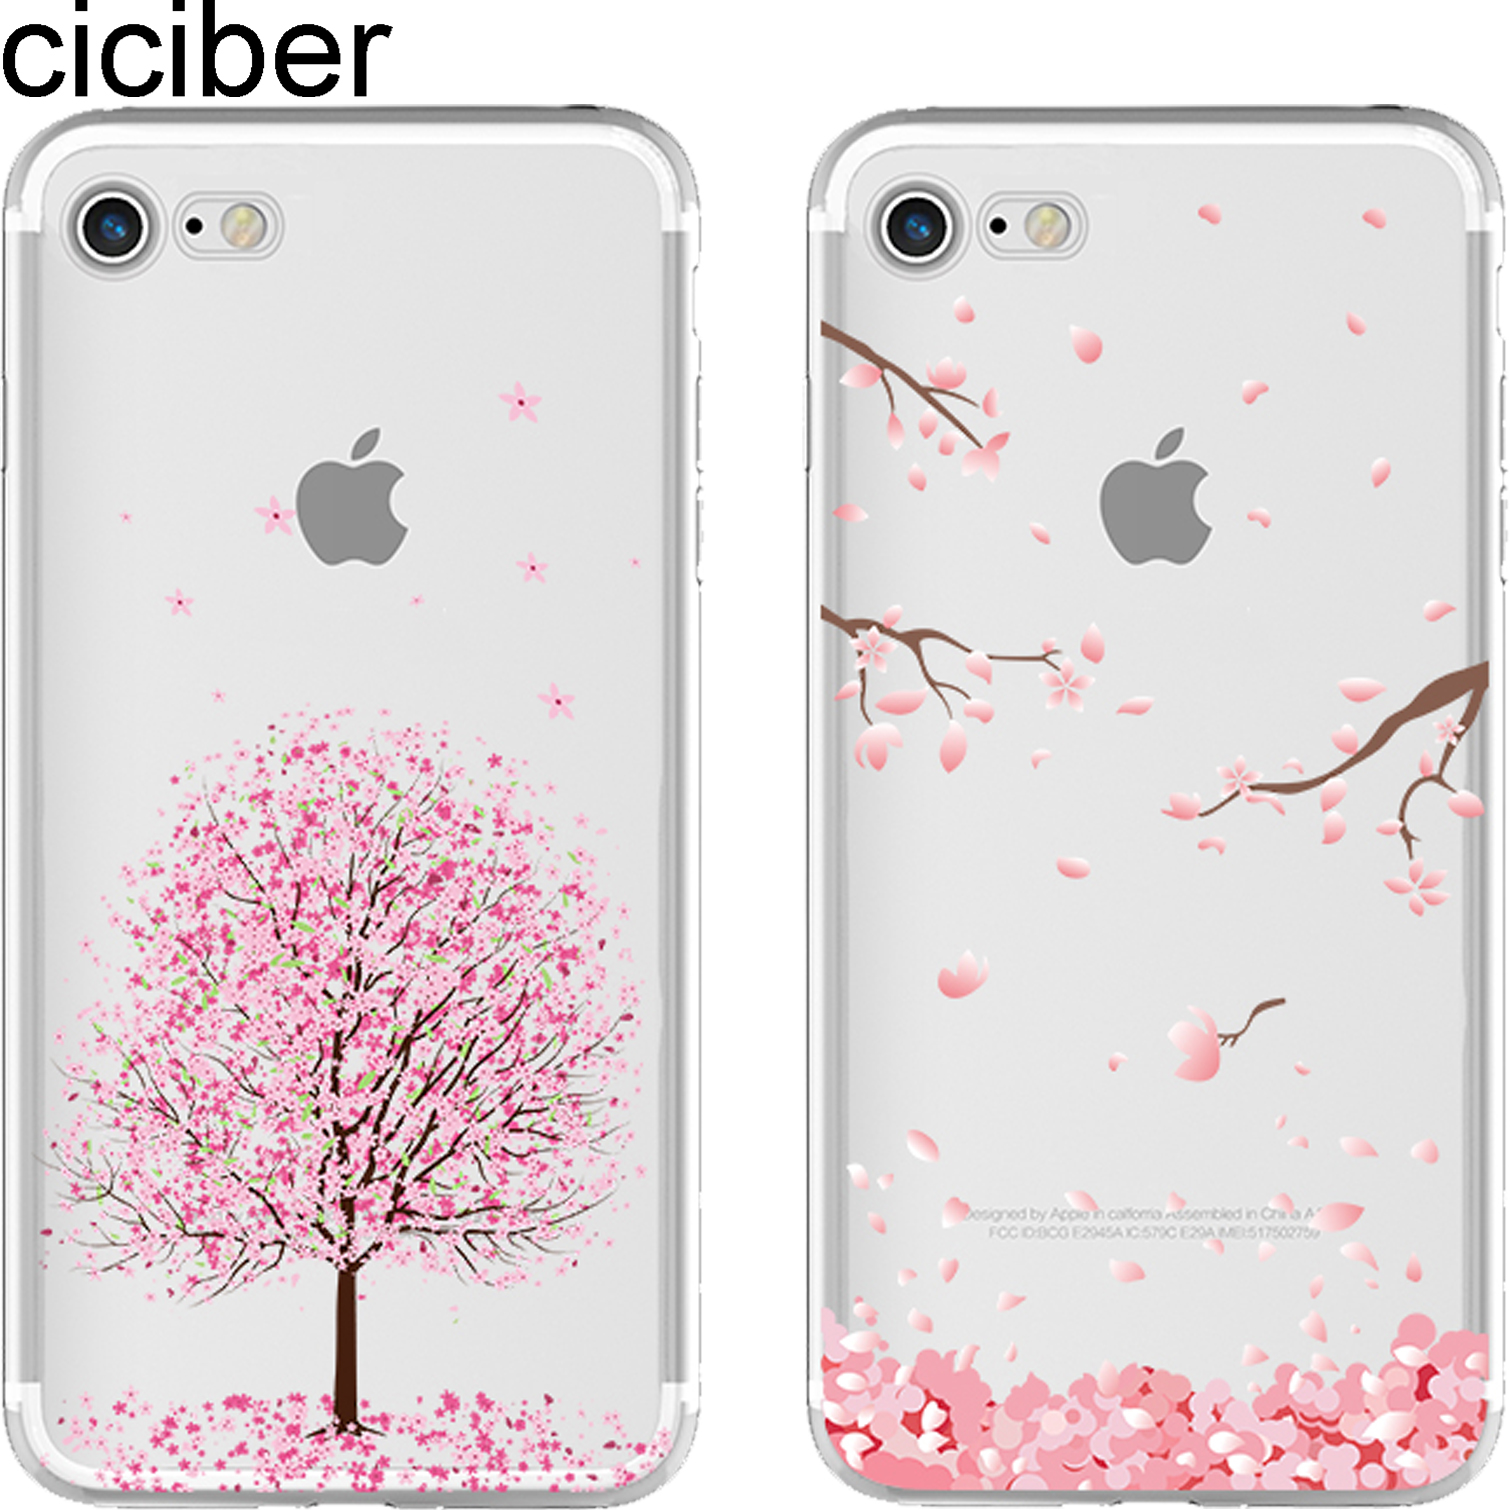 ciciber Romantic Japan Sweet Cherry Blossom Cat Soft